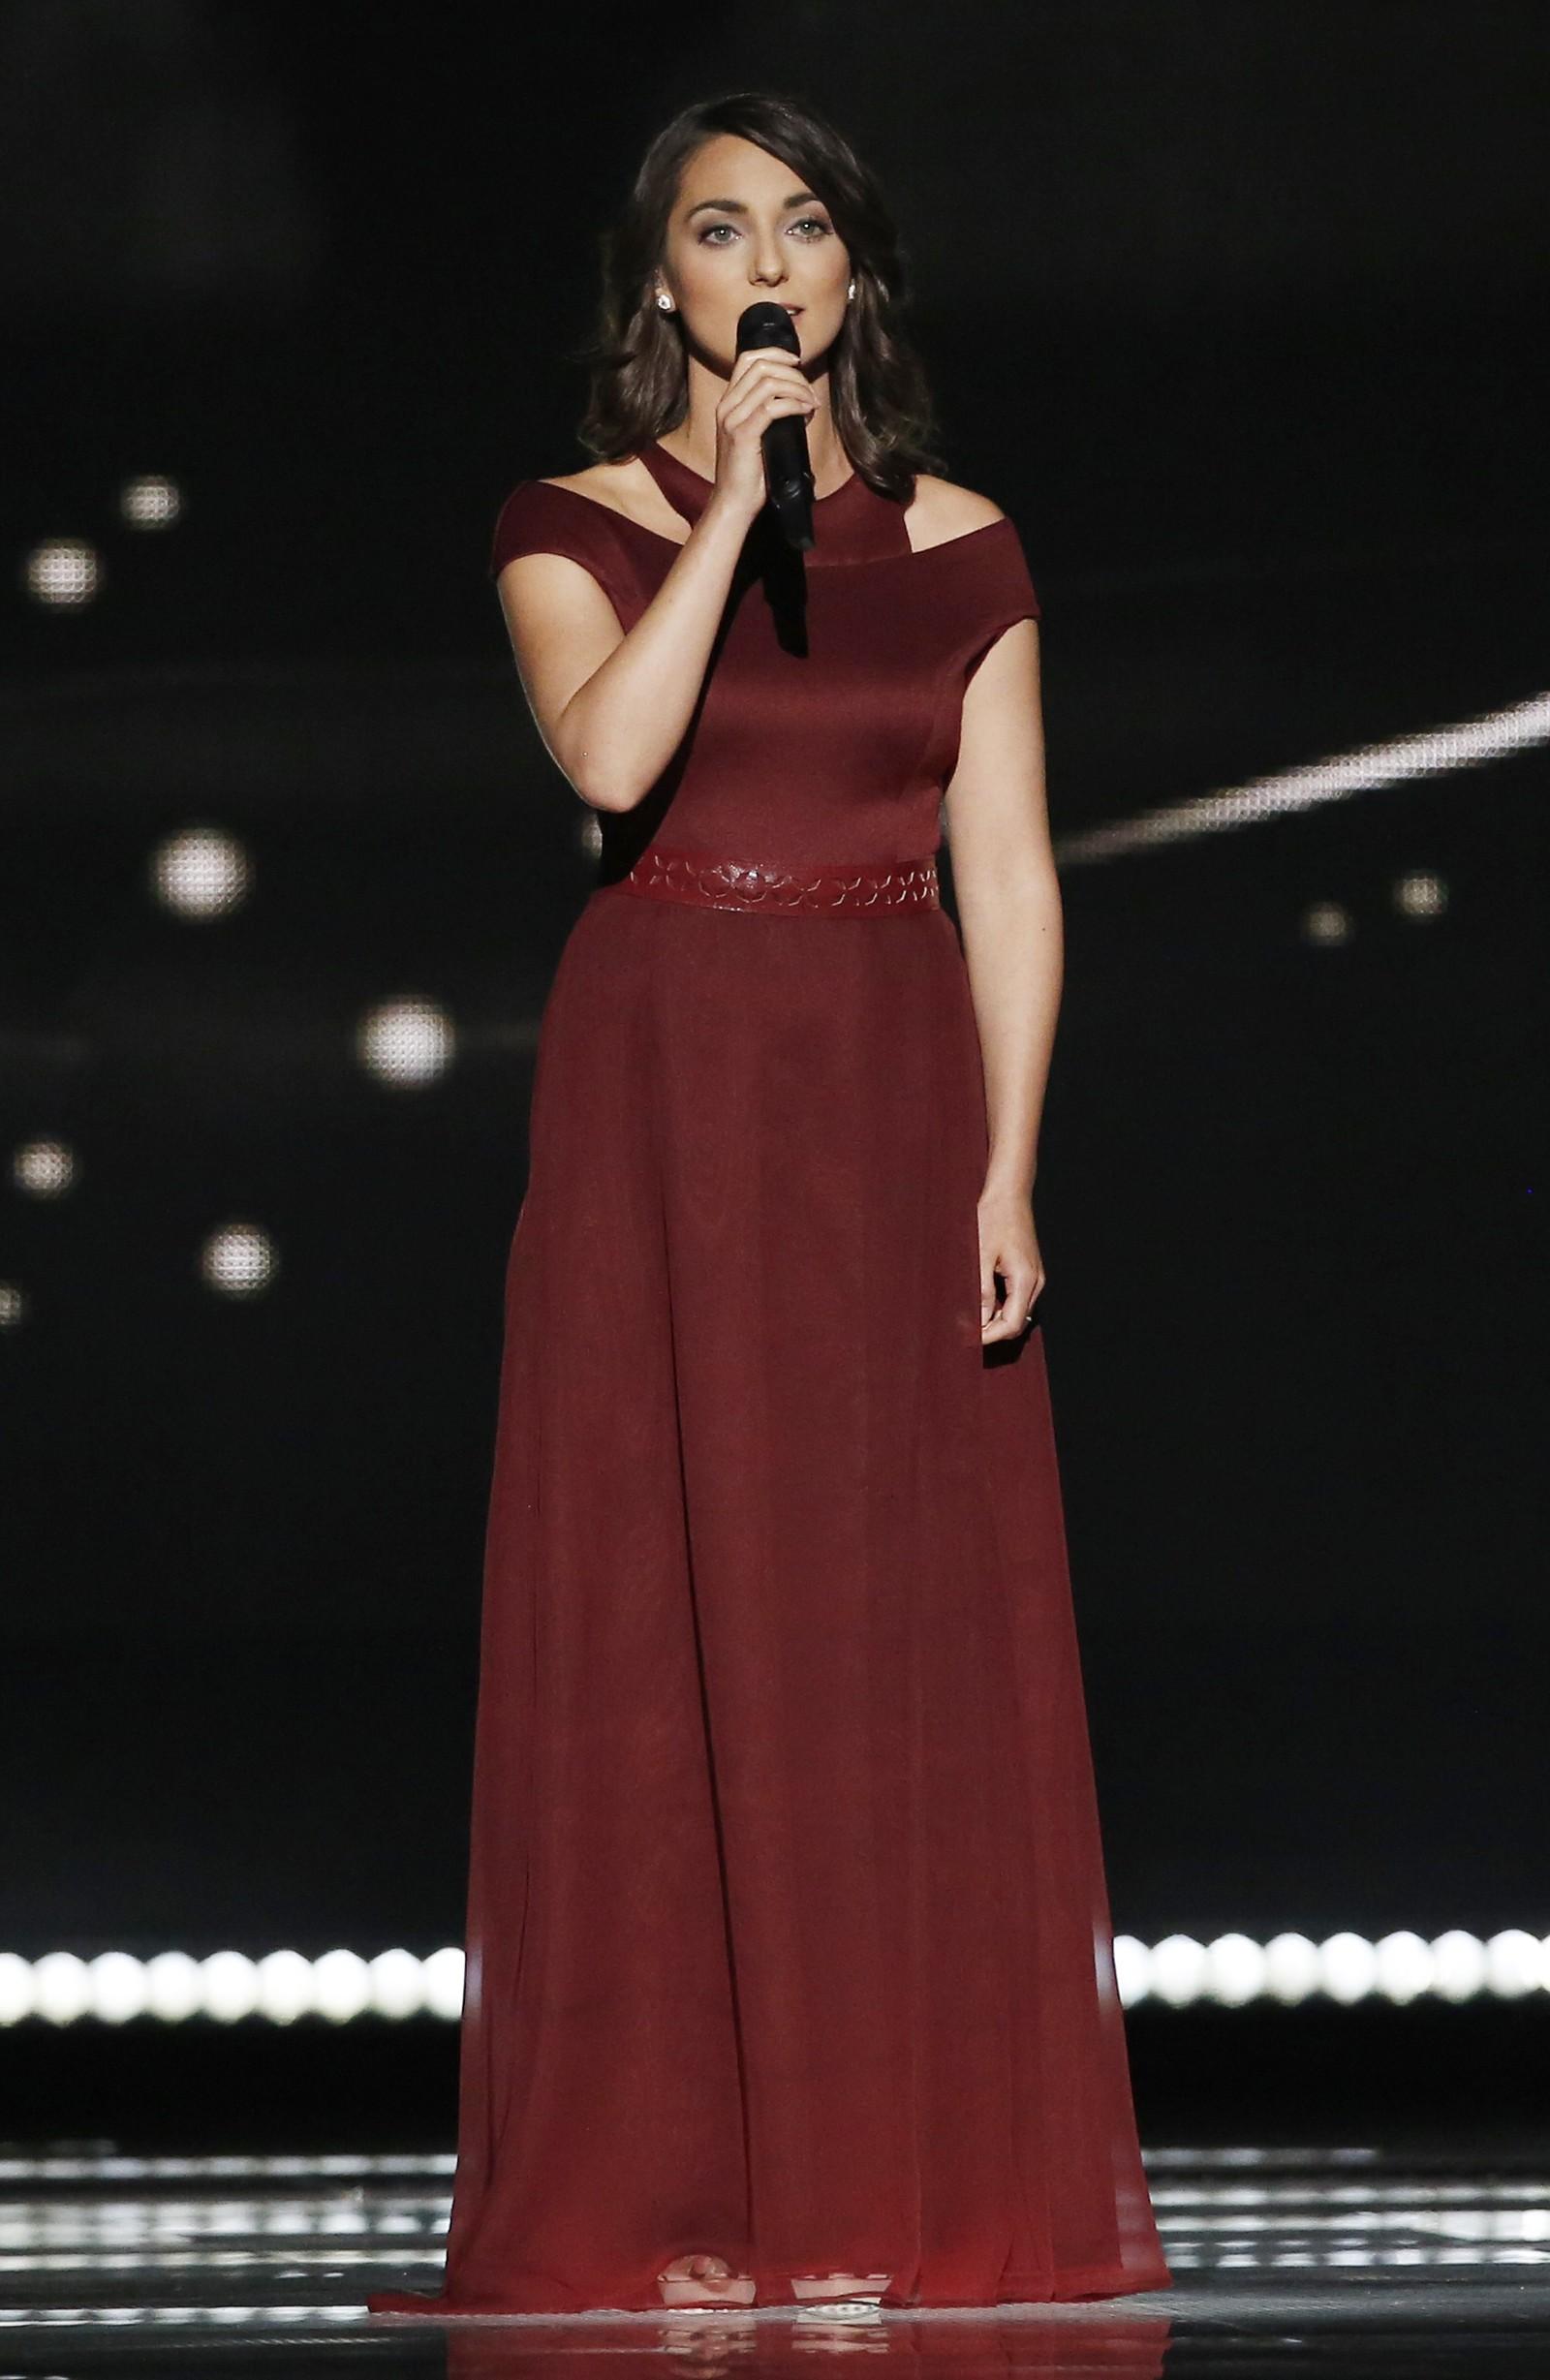 22. UNGARN: Ungarn har 28 år gamle Boggie i finalen. Hun heter egentlig Boglárka Csemer og er en ungarsk singer-songwriter. Låta hennes heter «Wars for Nothing».